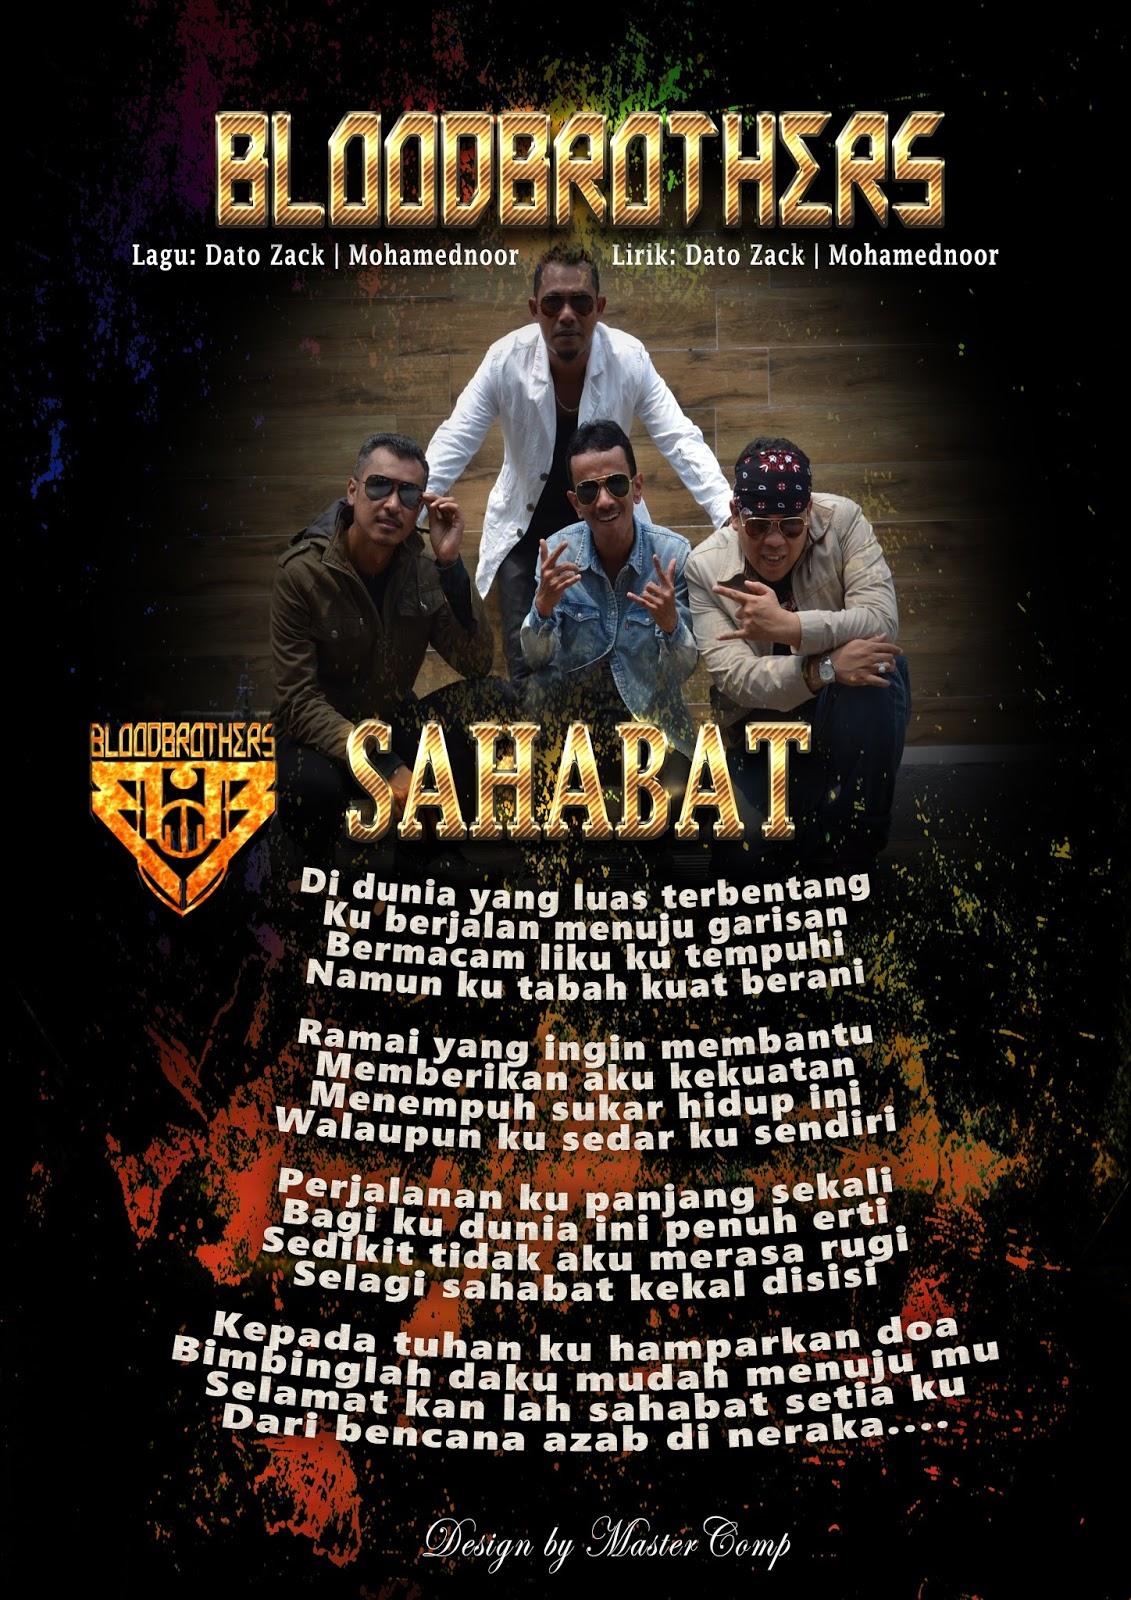 Lirik Bloodbrothers - Sahabat